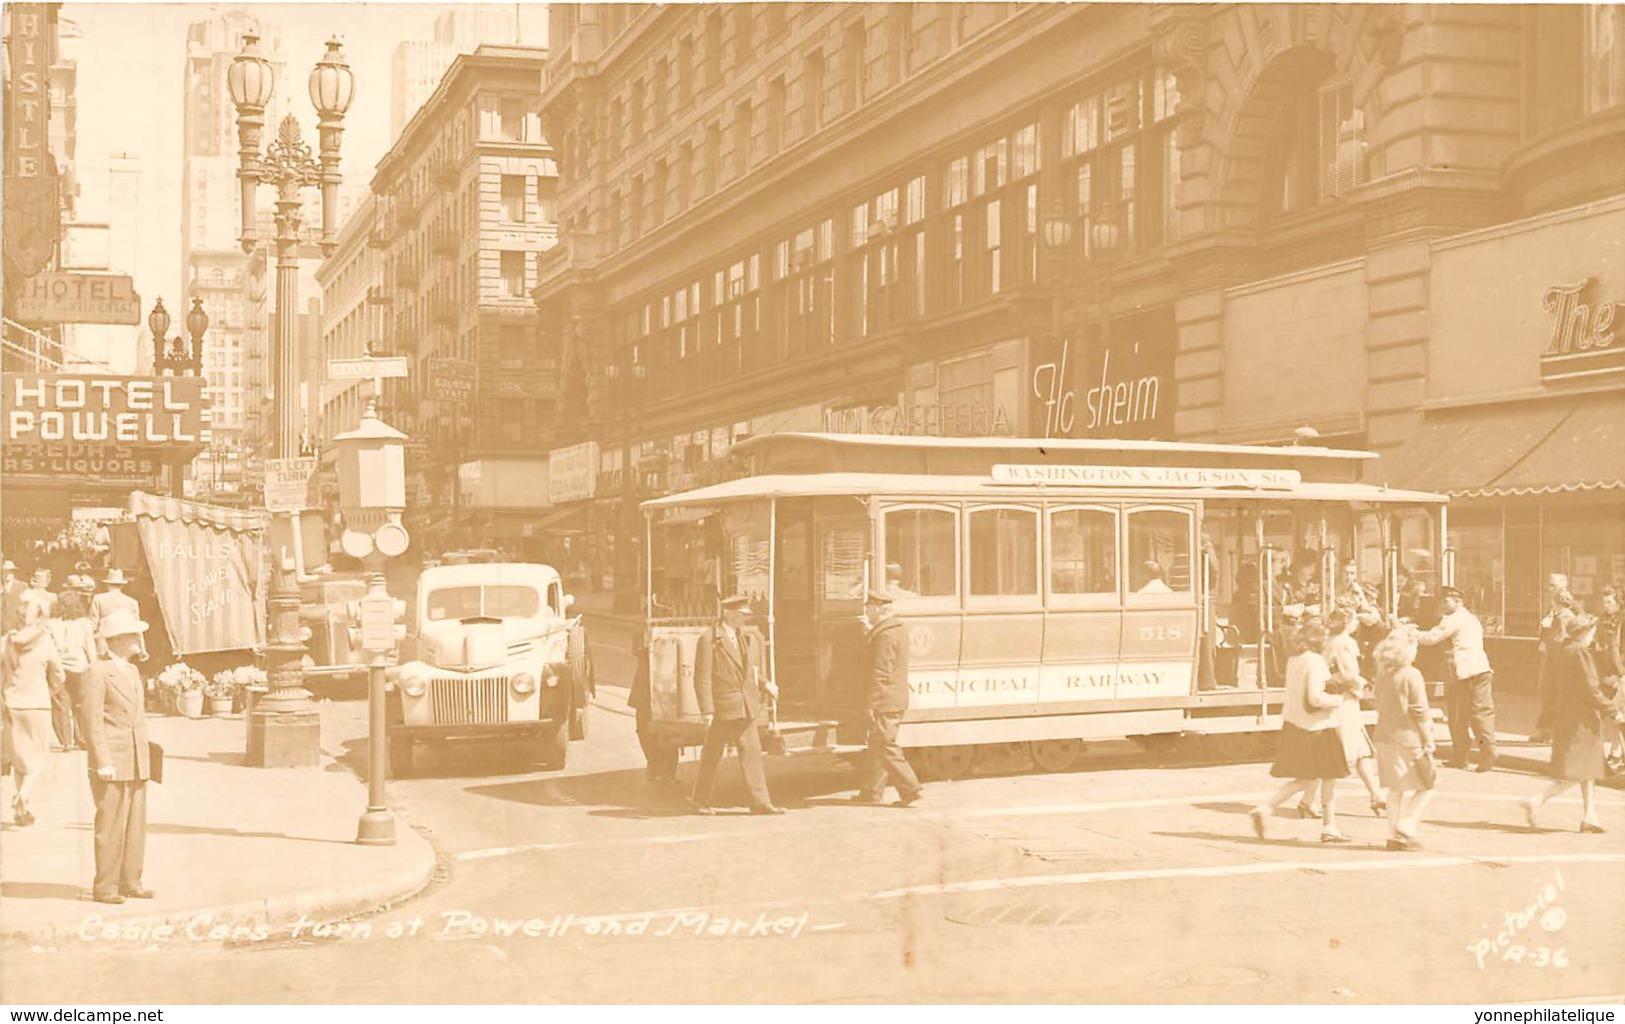 Thèmes - 10344 - Beau Plan Tramway - Photo Card - Tramway - Cartoline